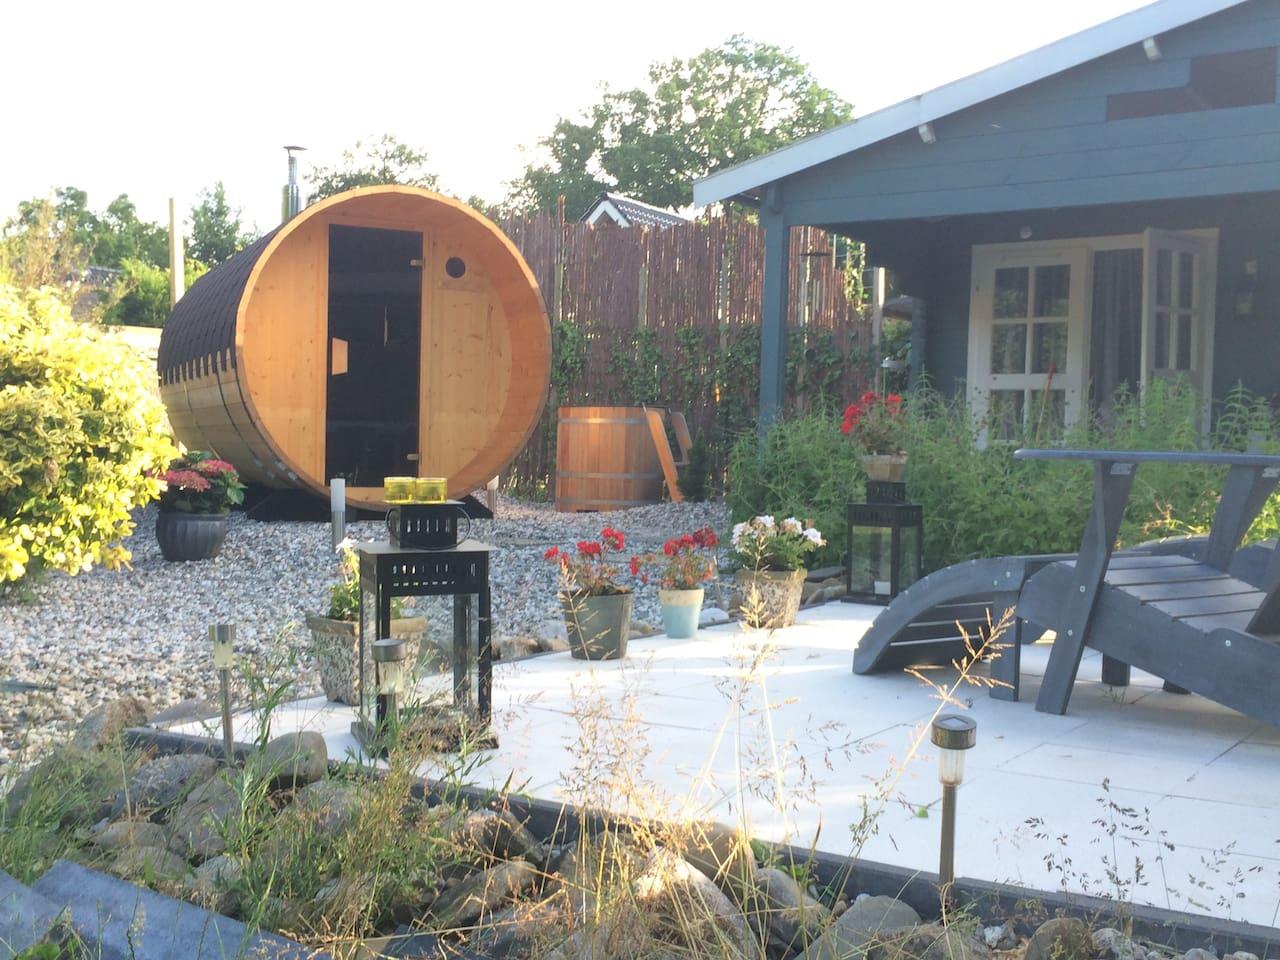 Le petit sauna blockhütten zur miete in ter apel groningen